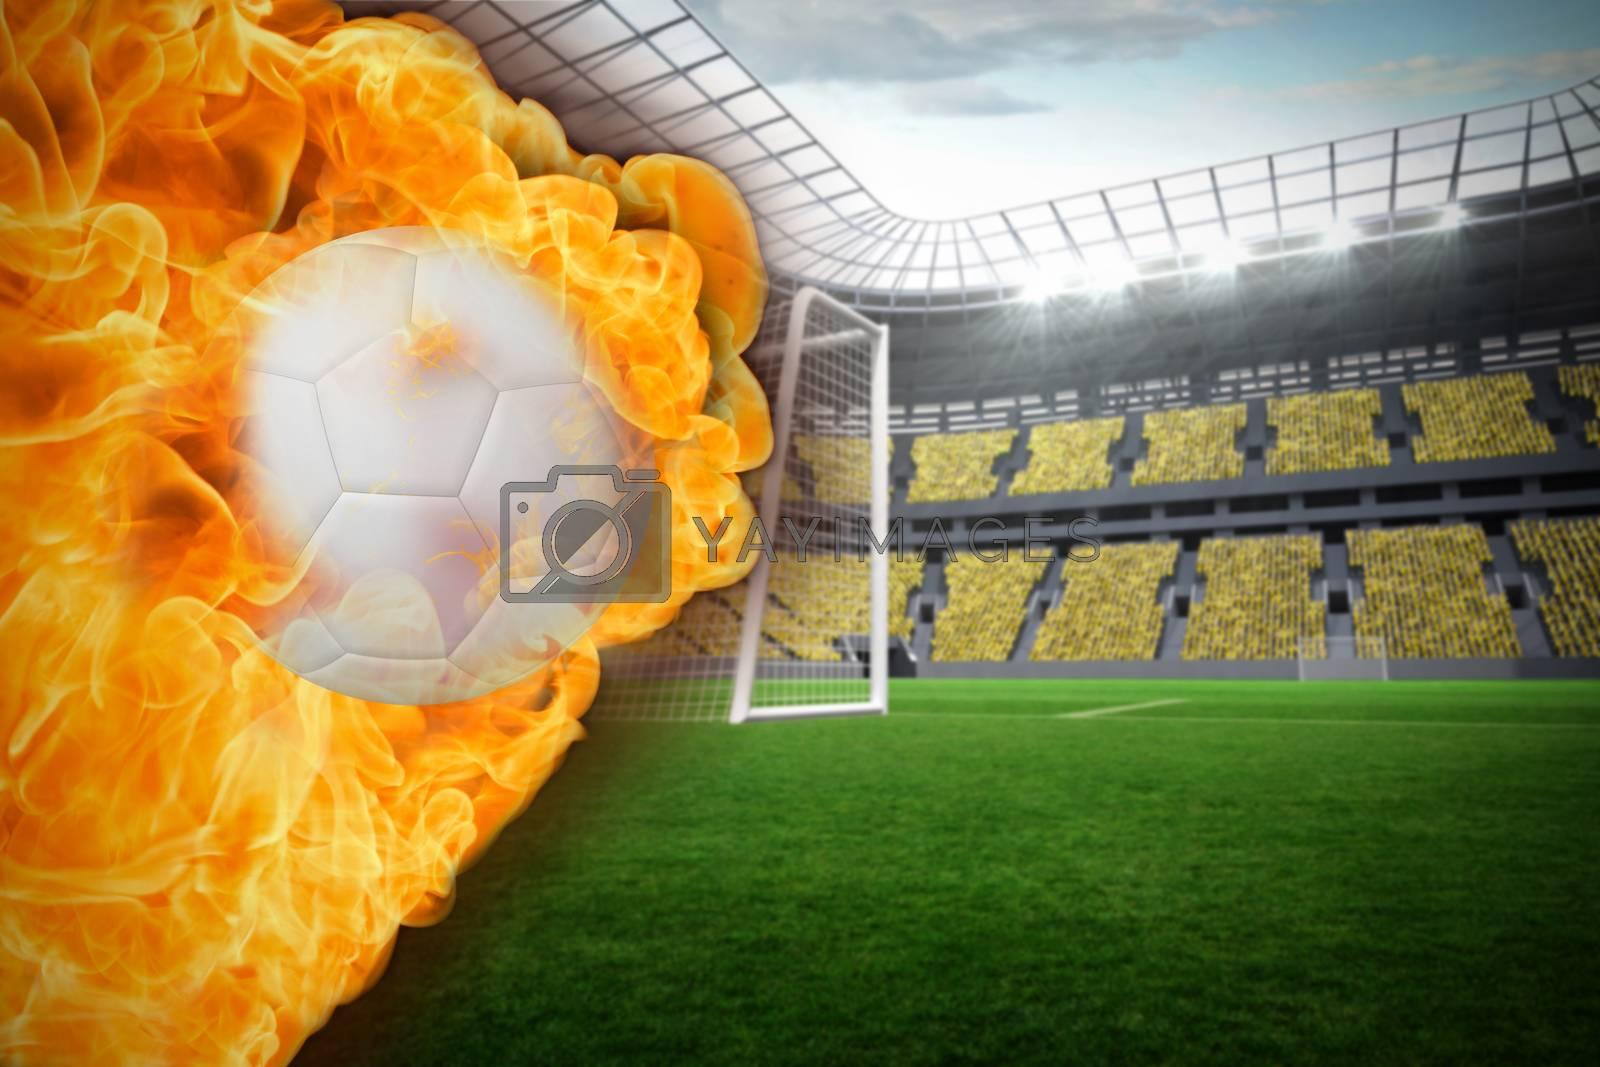 Fire surrounding football by Wavebreakmedia